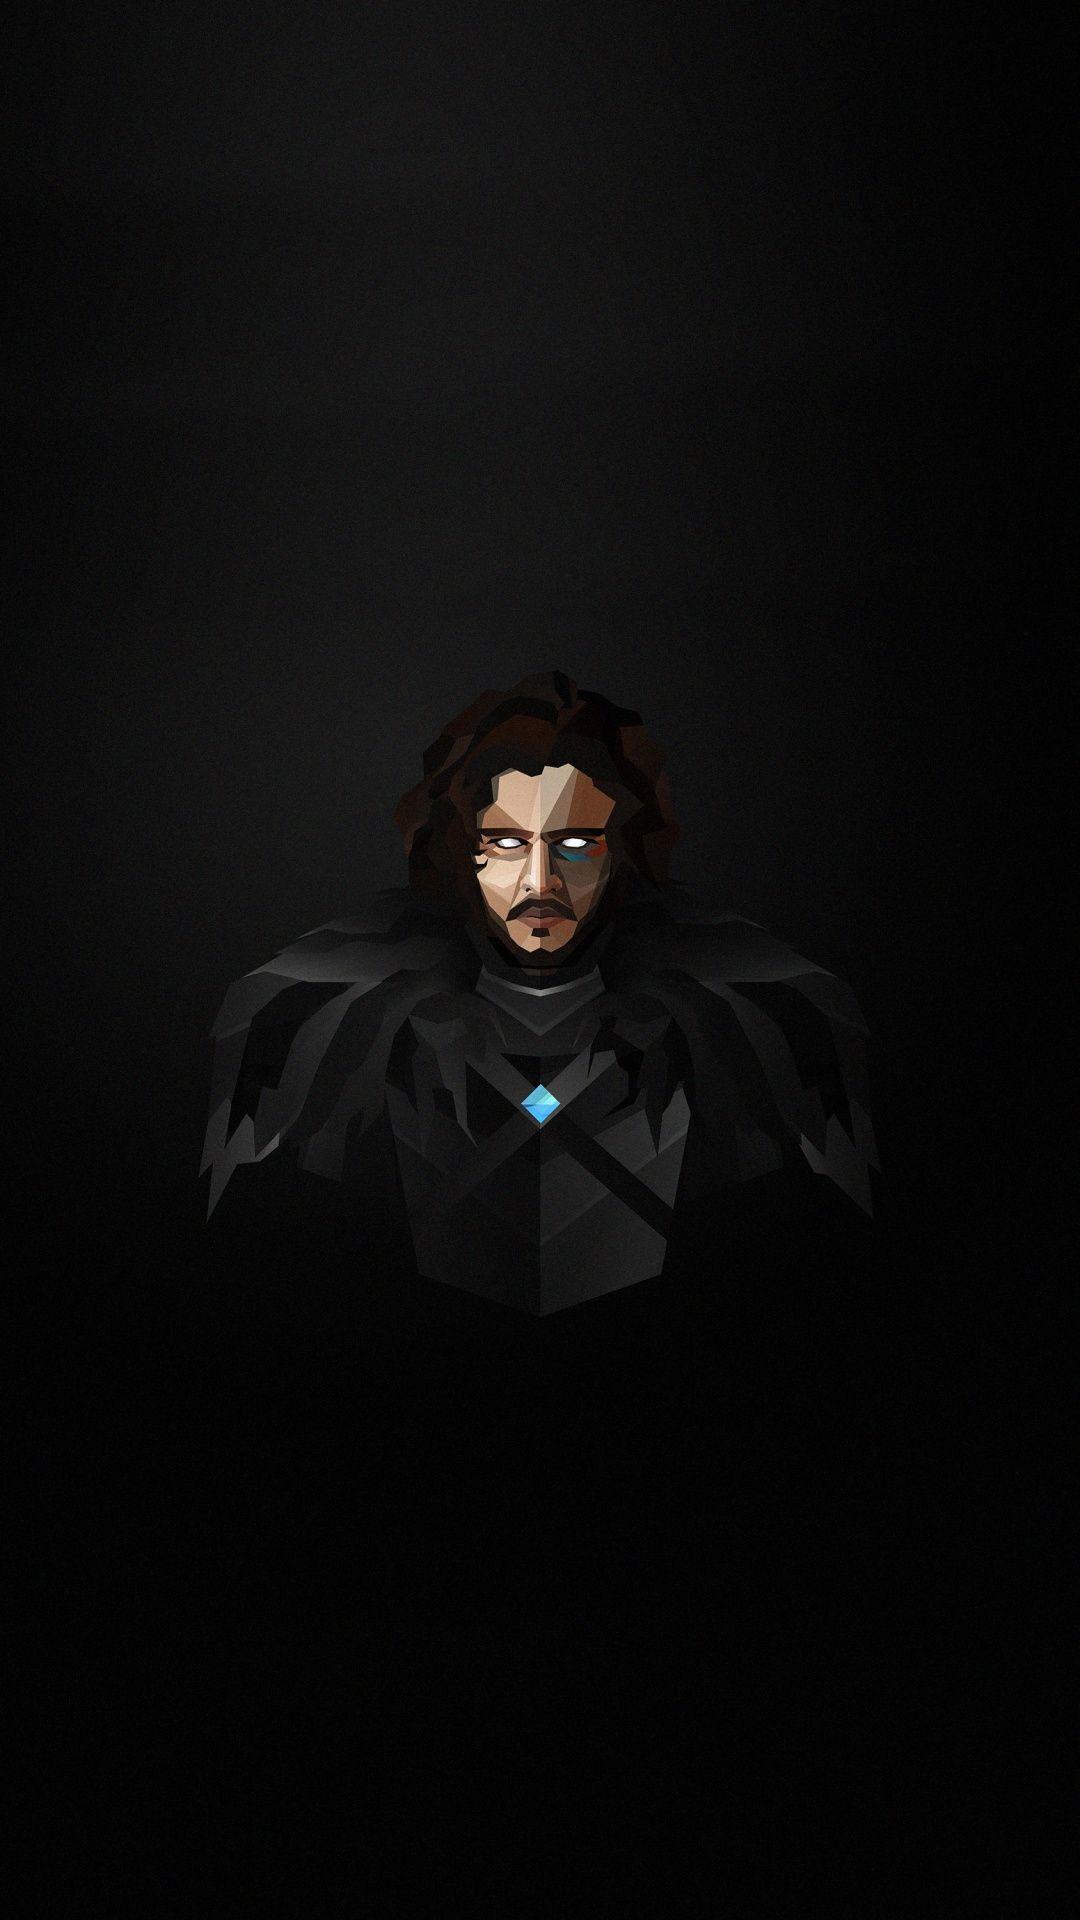 Minimal Art Game Of Thrones Jon Snow Wallpaper Snow Wallpaper Iphone Jon Snow Game Of Thrones